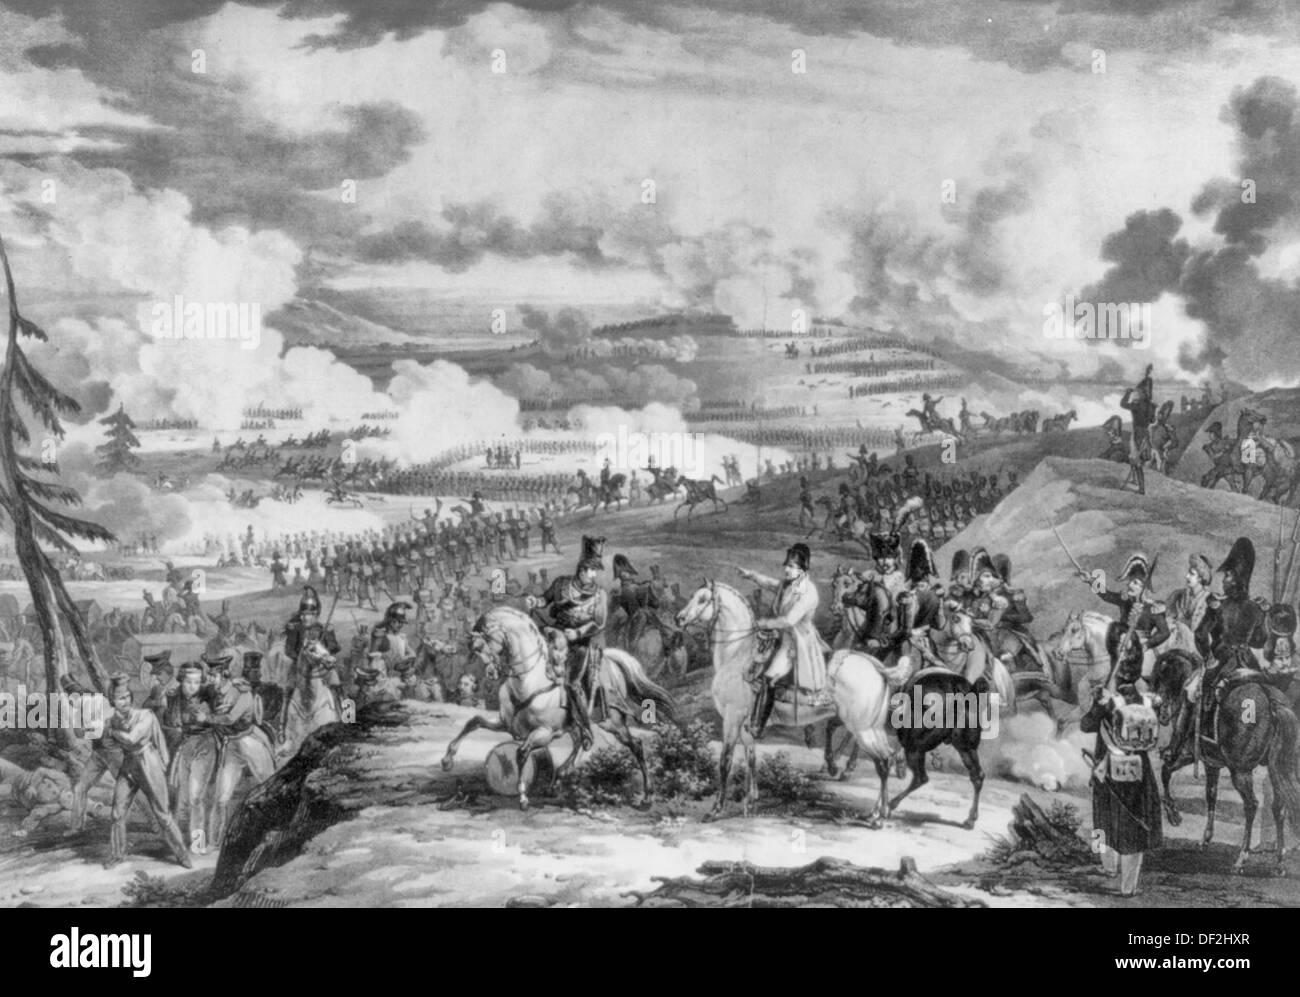 Bataille de la Moscowa, Battle of Moscow, 1812 - Napoleon I invasion Russia  -